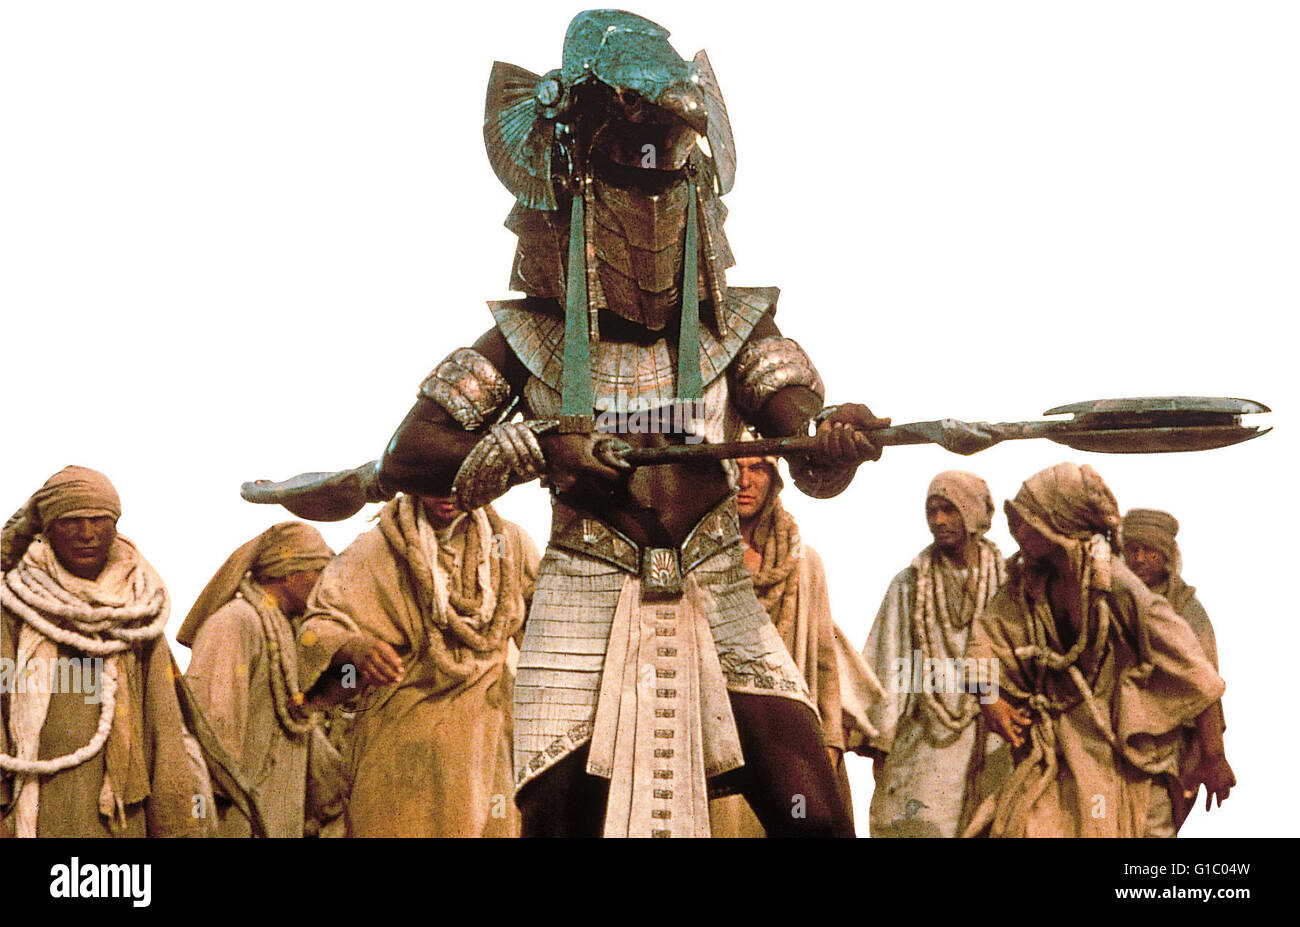 StargateAuch als Eps-Datei Stockbild